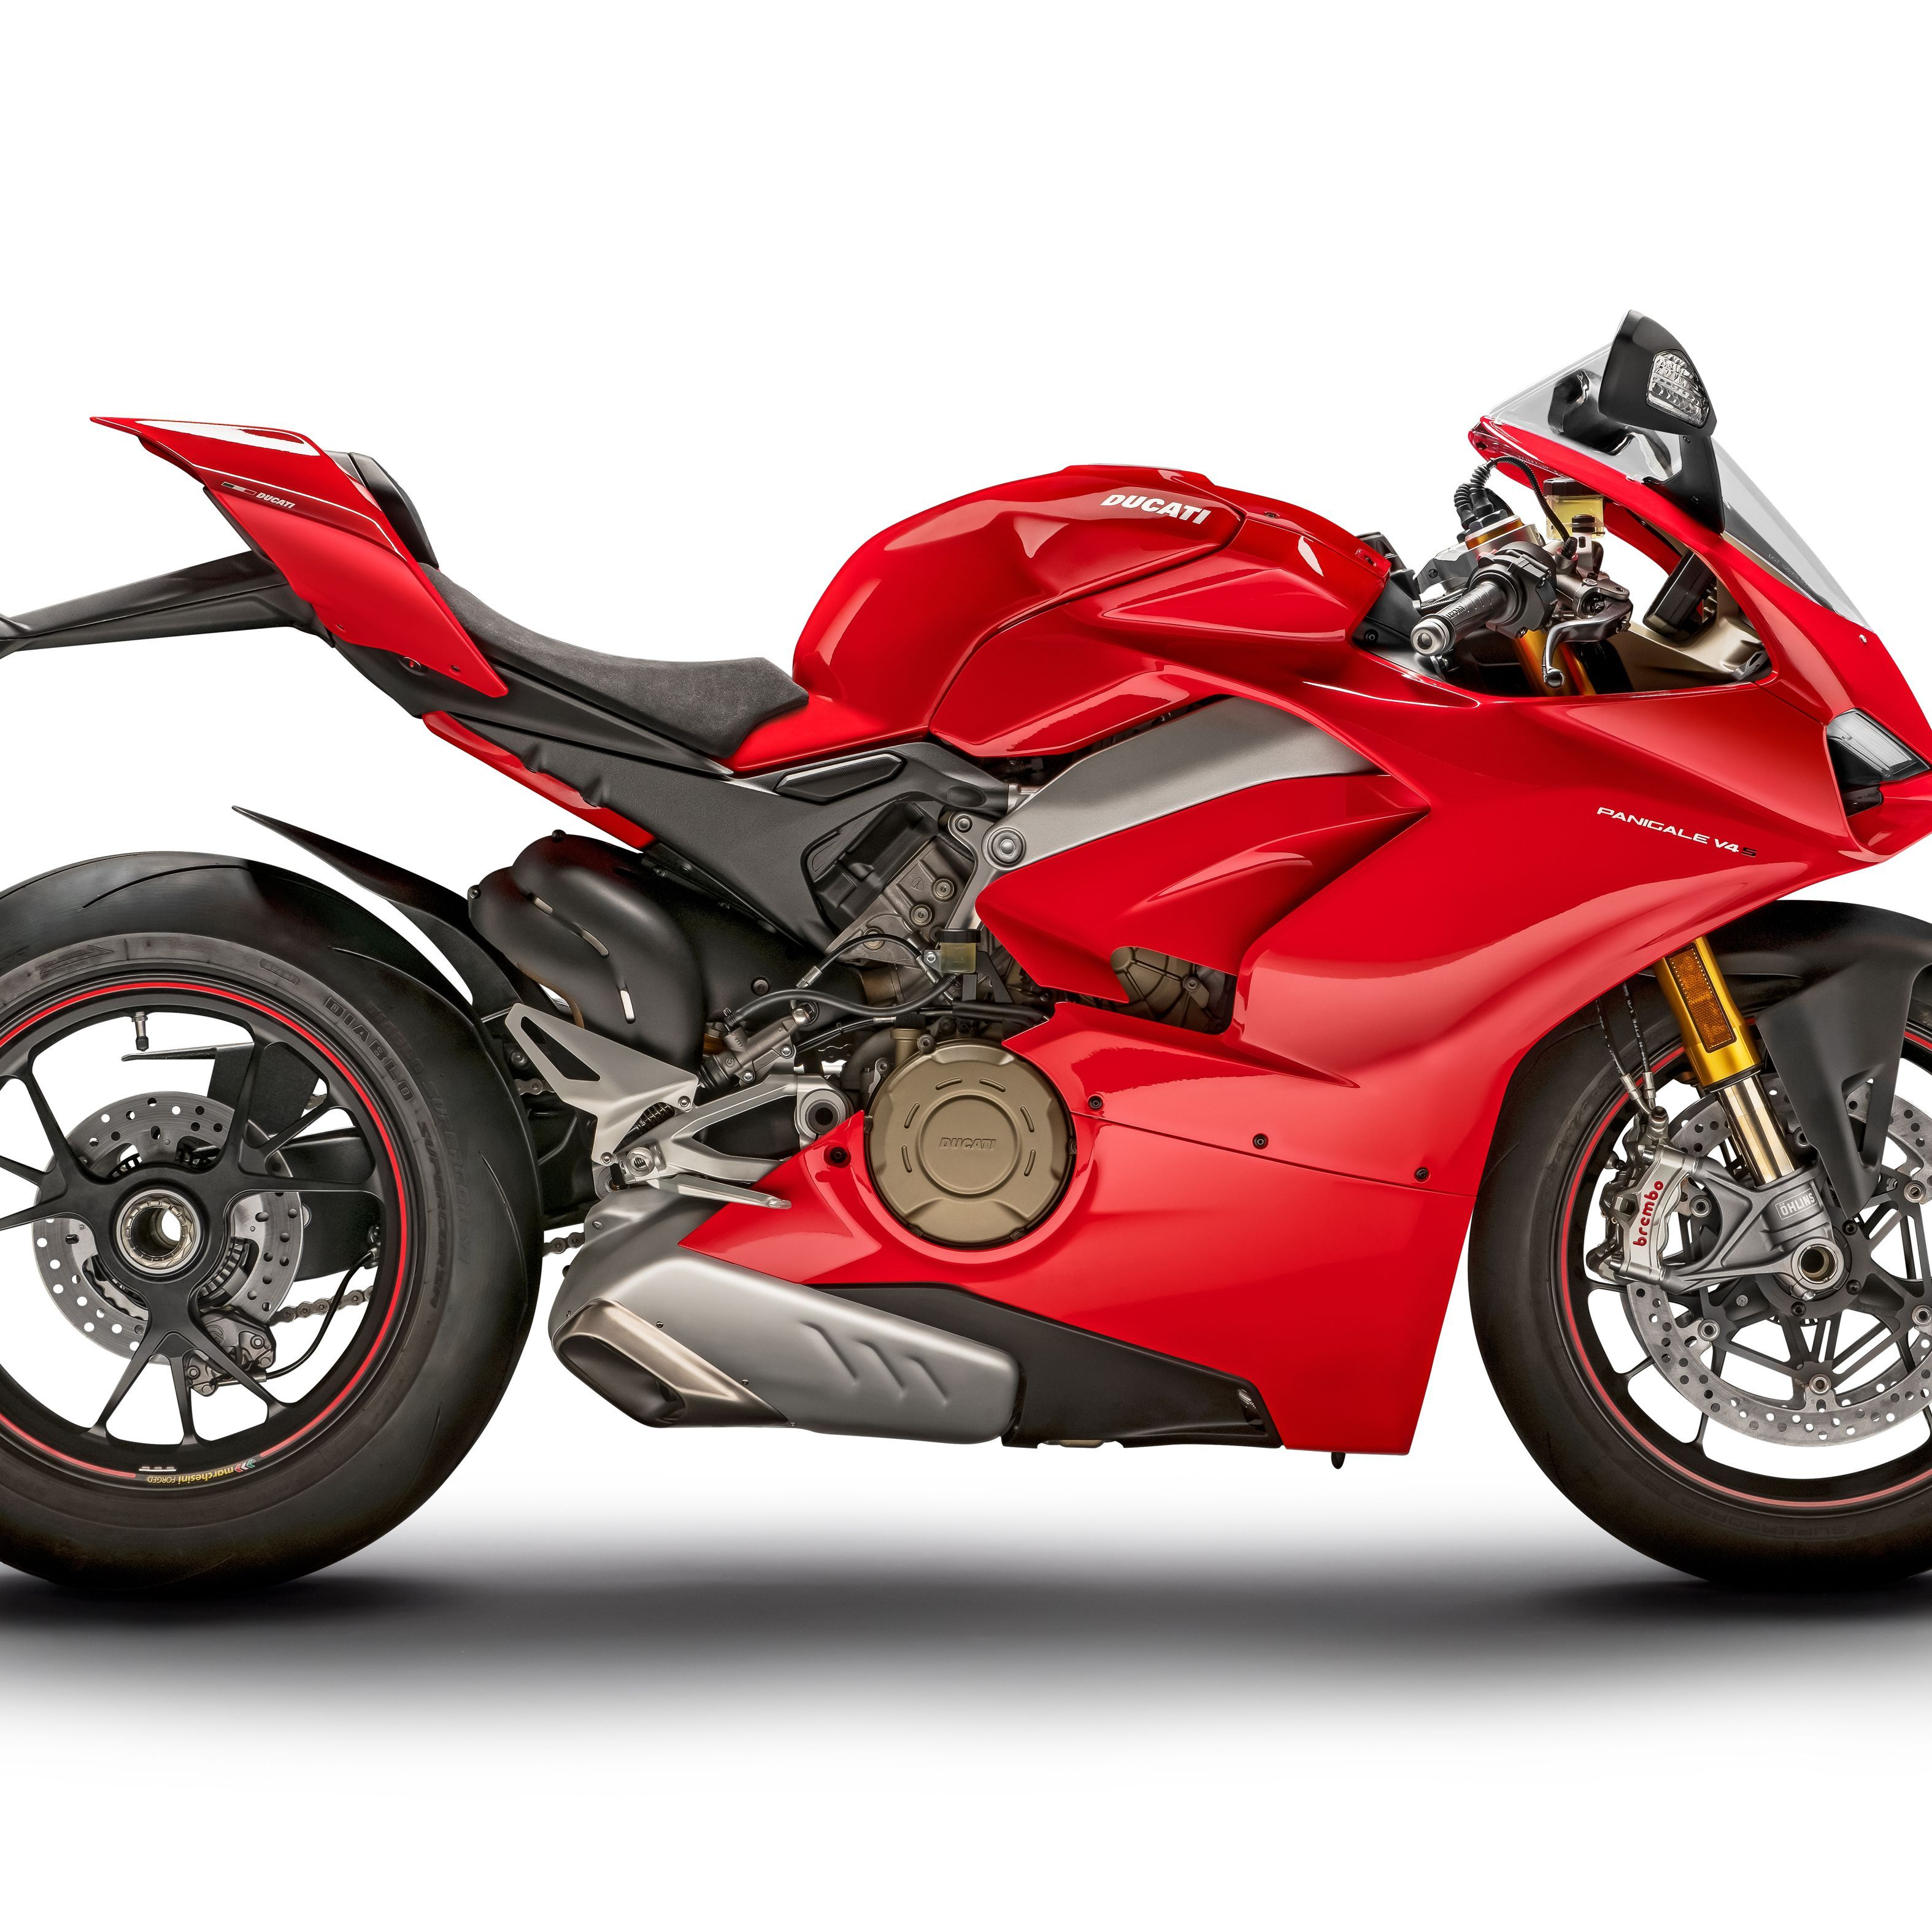 Episode 1 - Ducati Panigale V4 S Press Launch